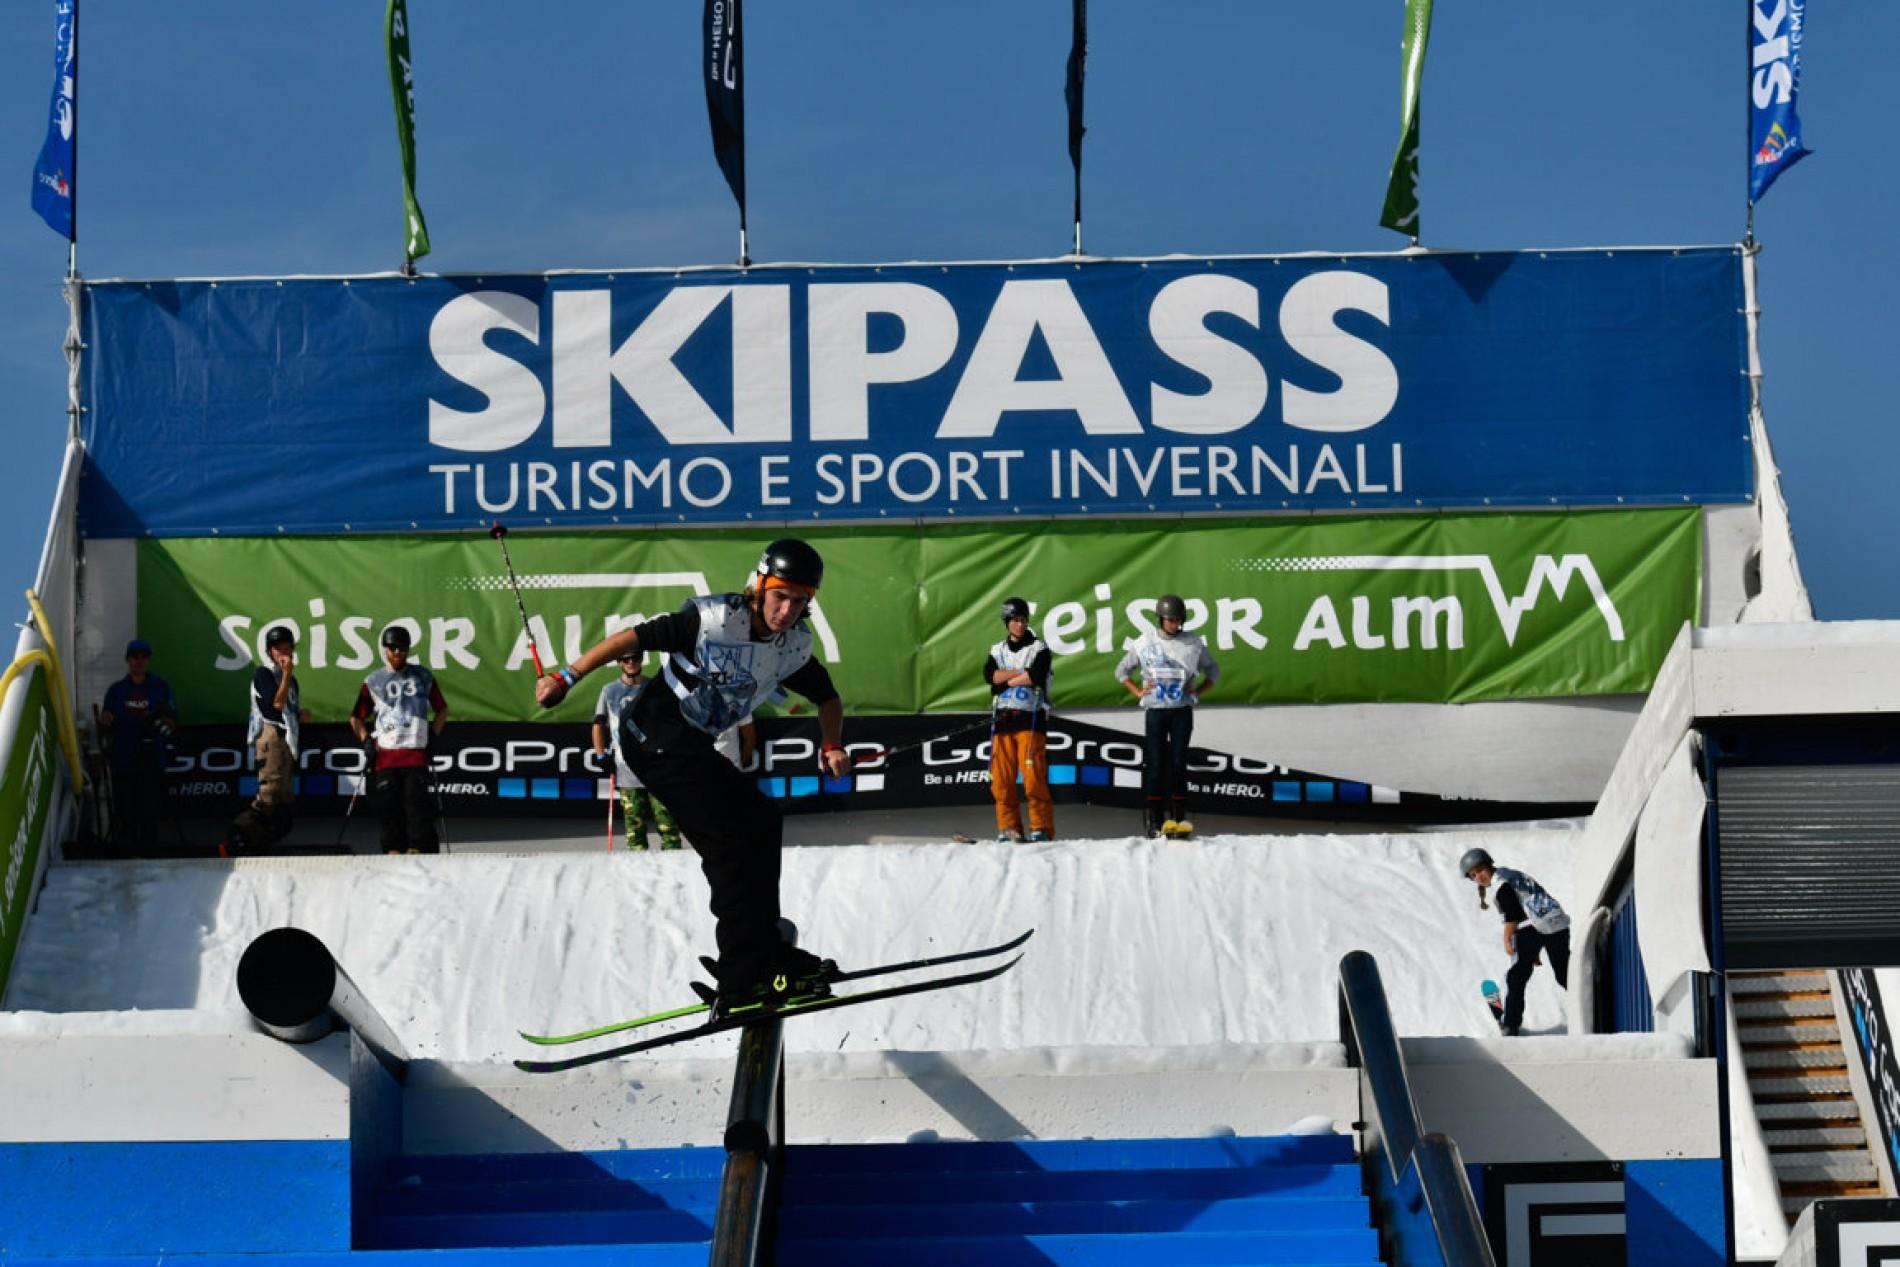 Skipass 2017, adrenalina in pista!